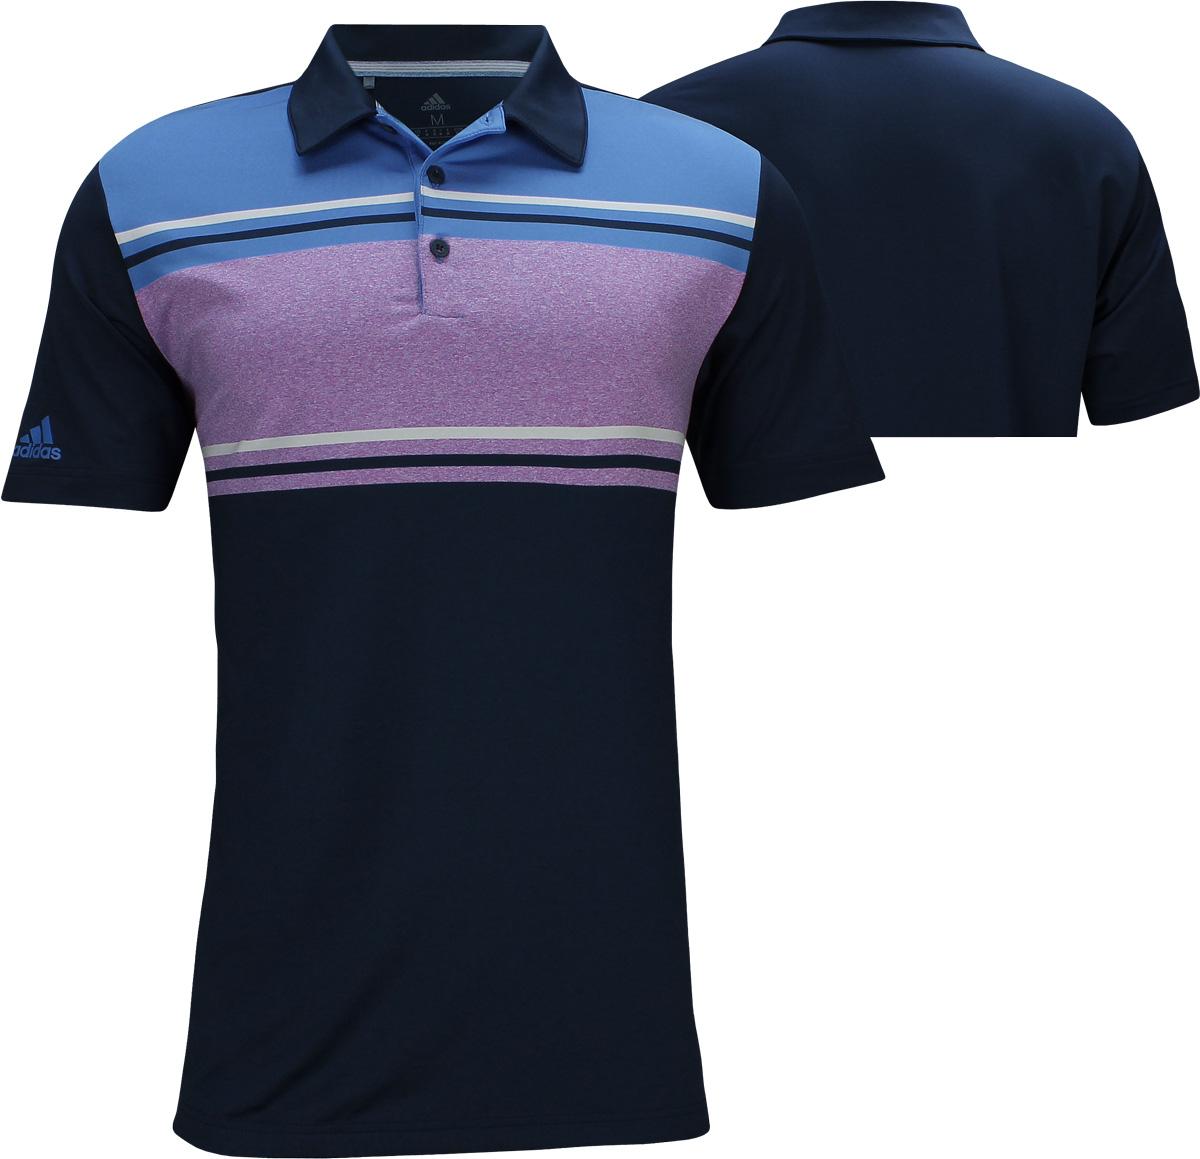 Adidas Ultimate 365 Classic Merch Golf